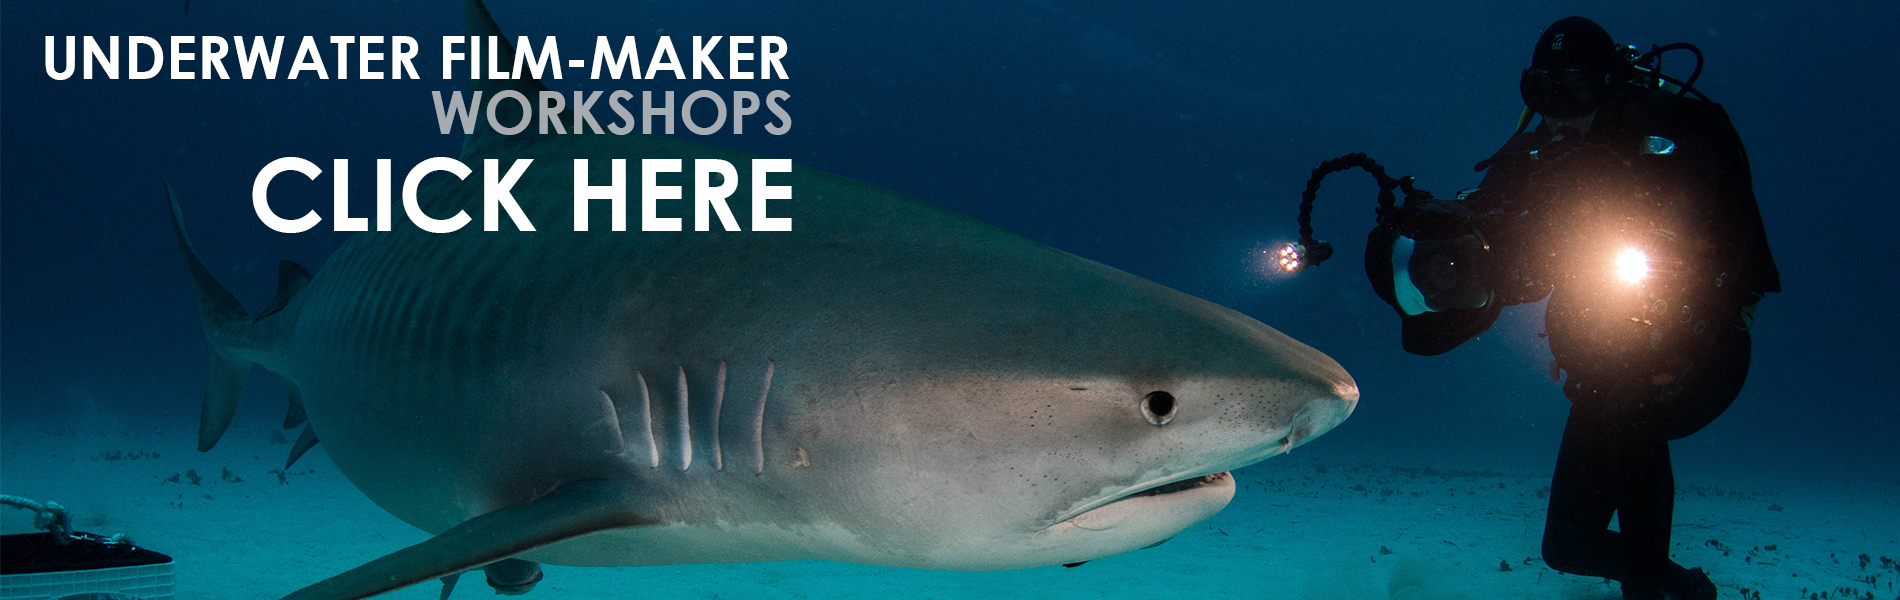 Underwater Filmmaker Workshops